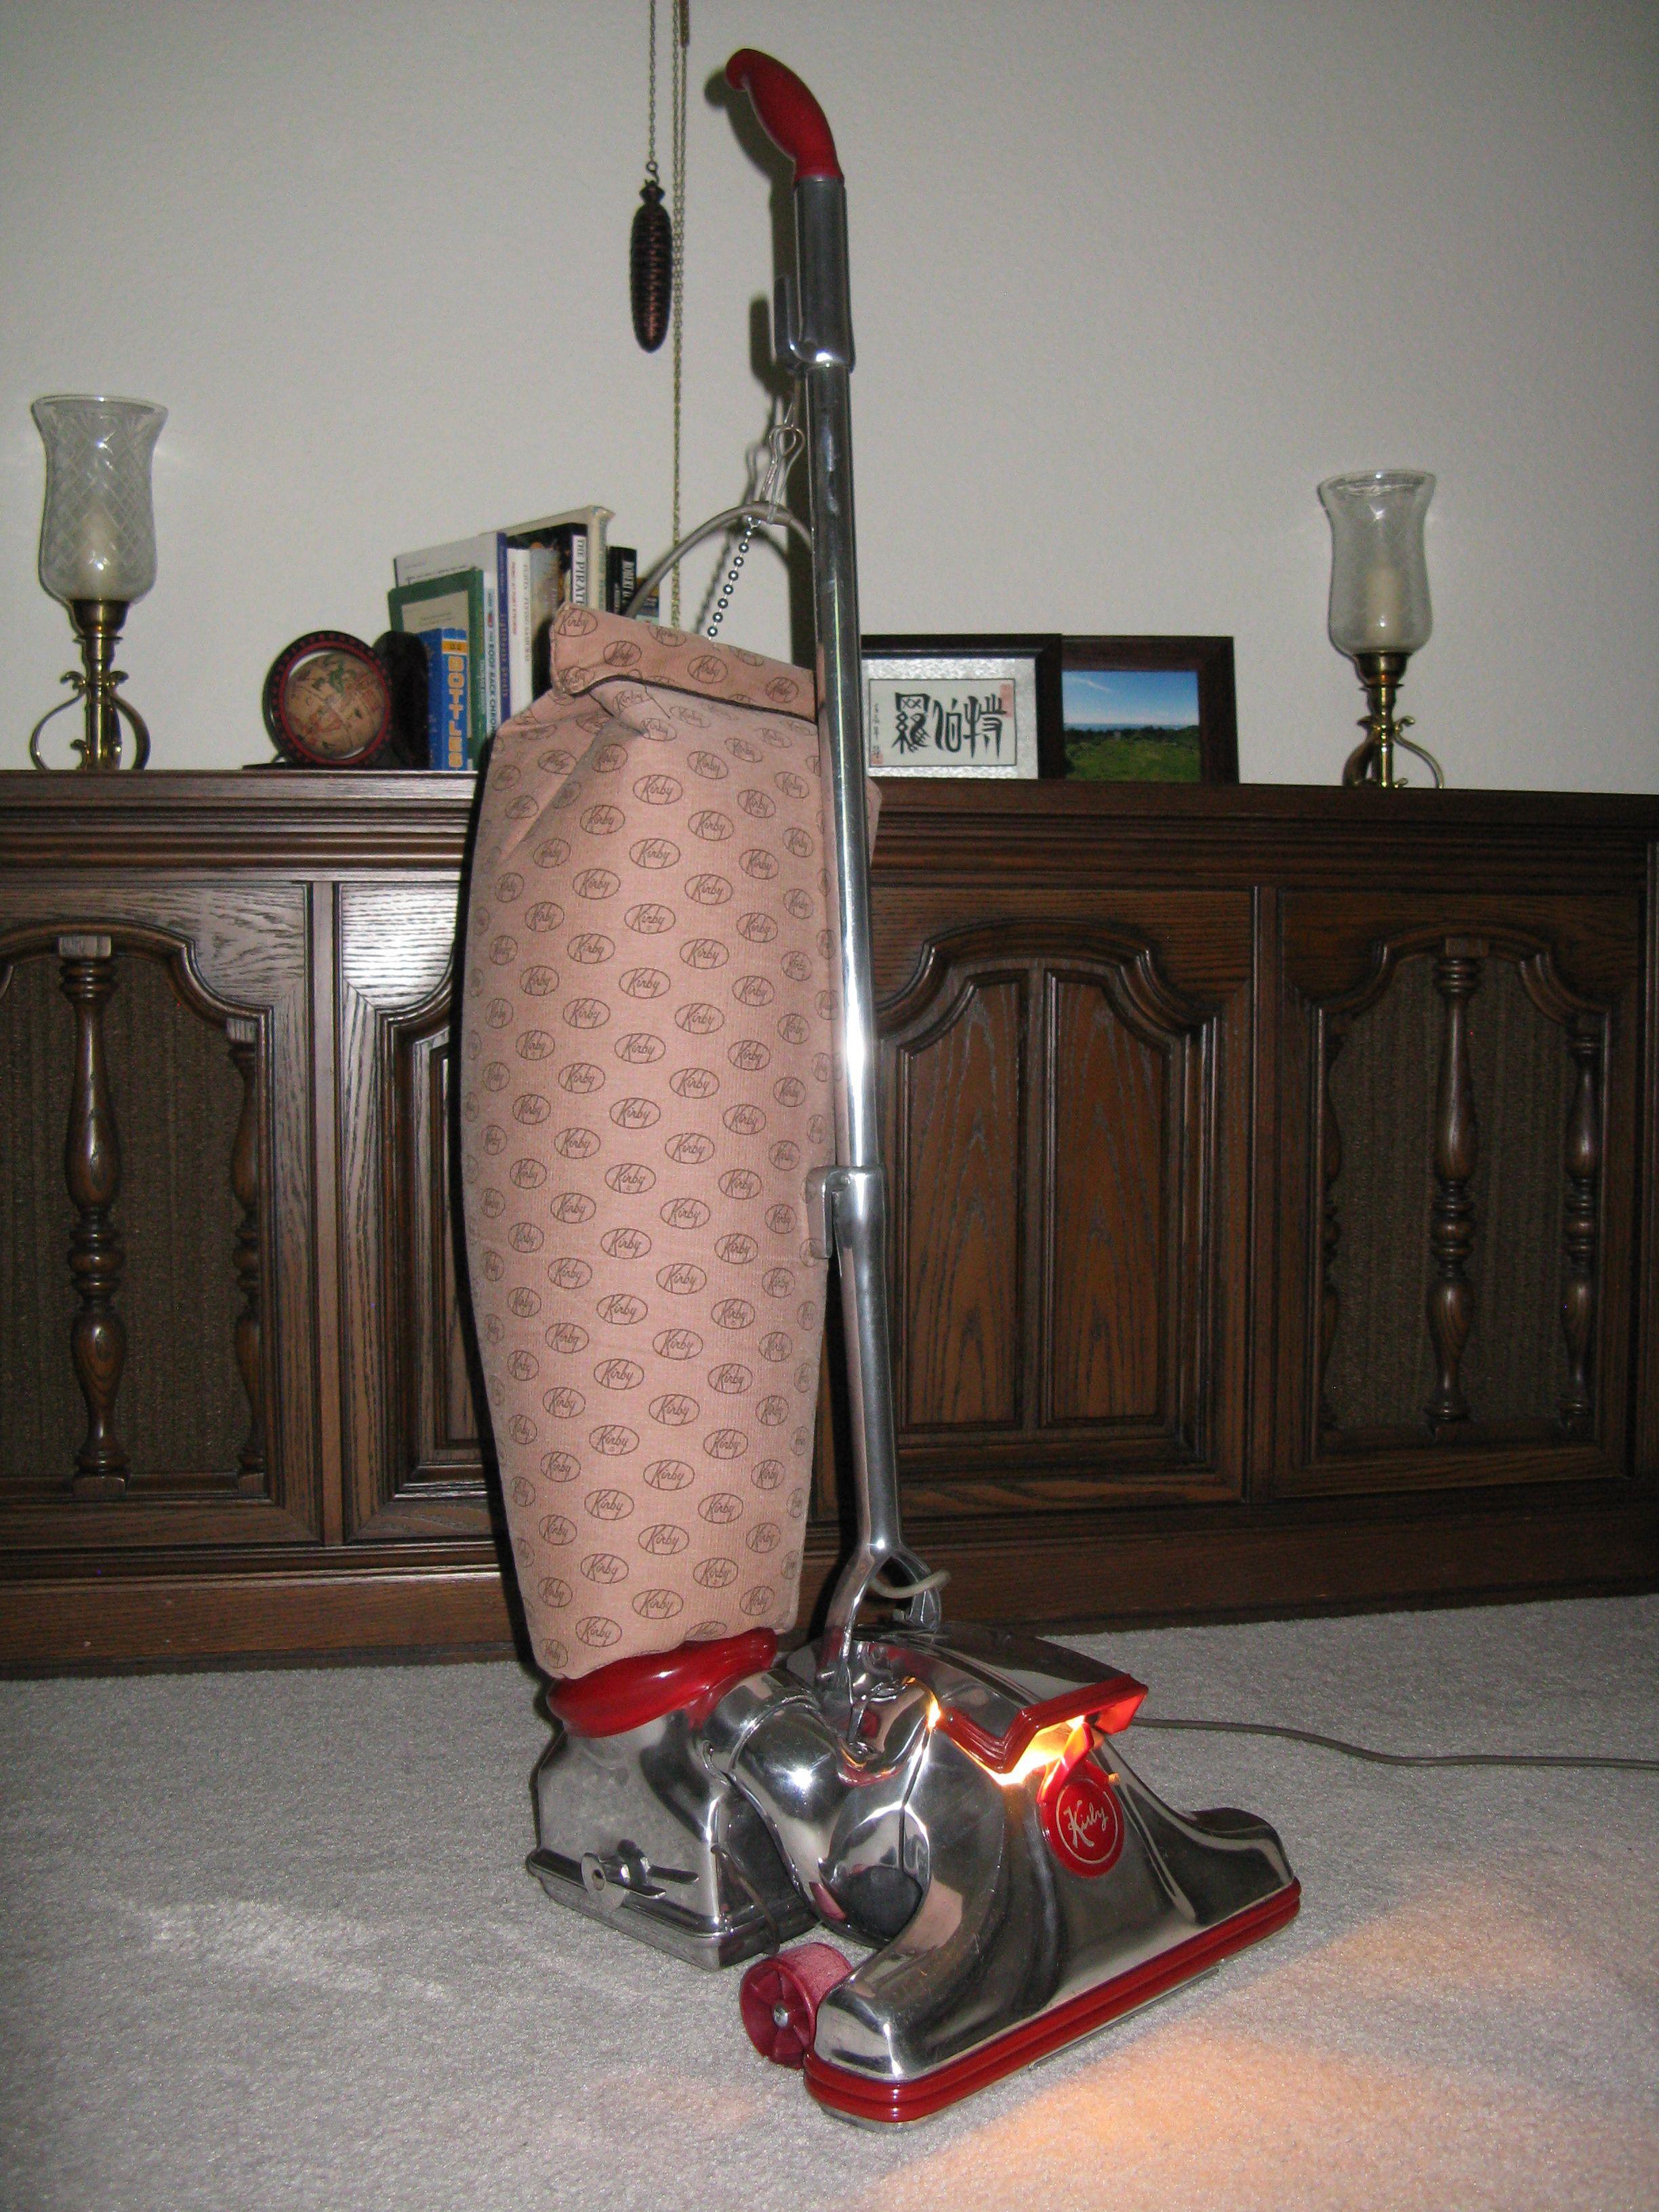 Pin By Kirby Vacuum Person On Kirby Vacuums Kirby Vacuum Vacuum Cleaner Kirby